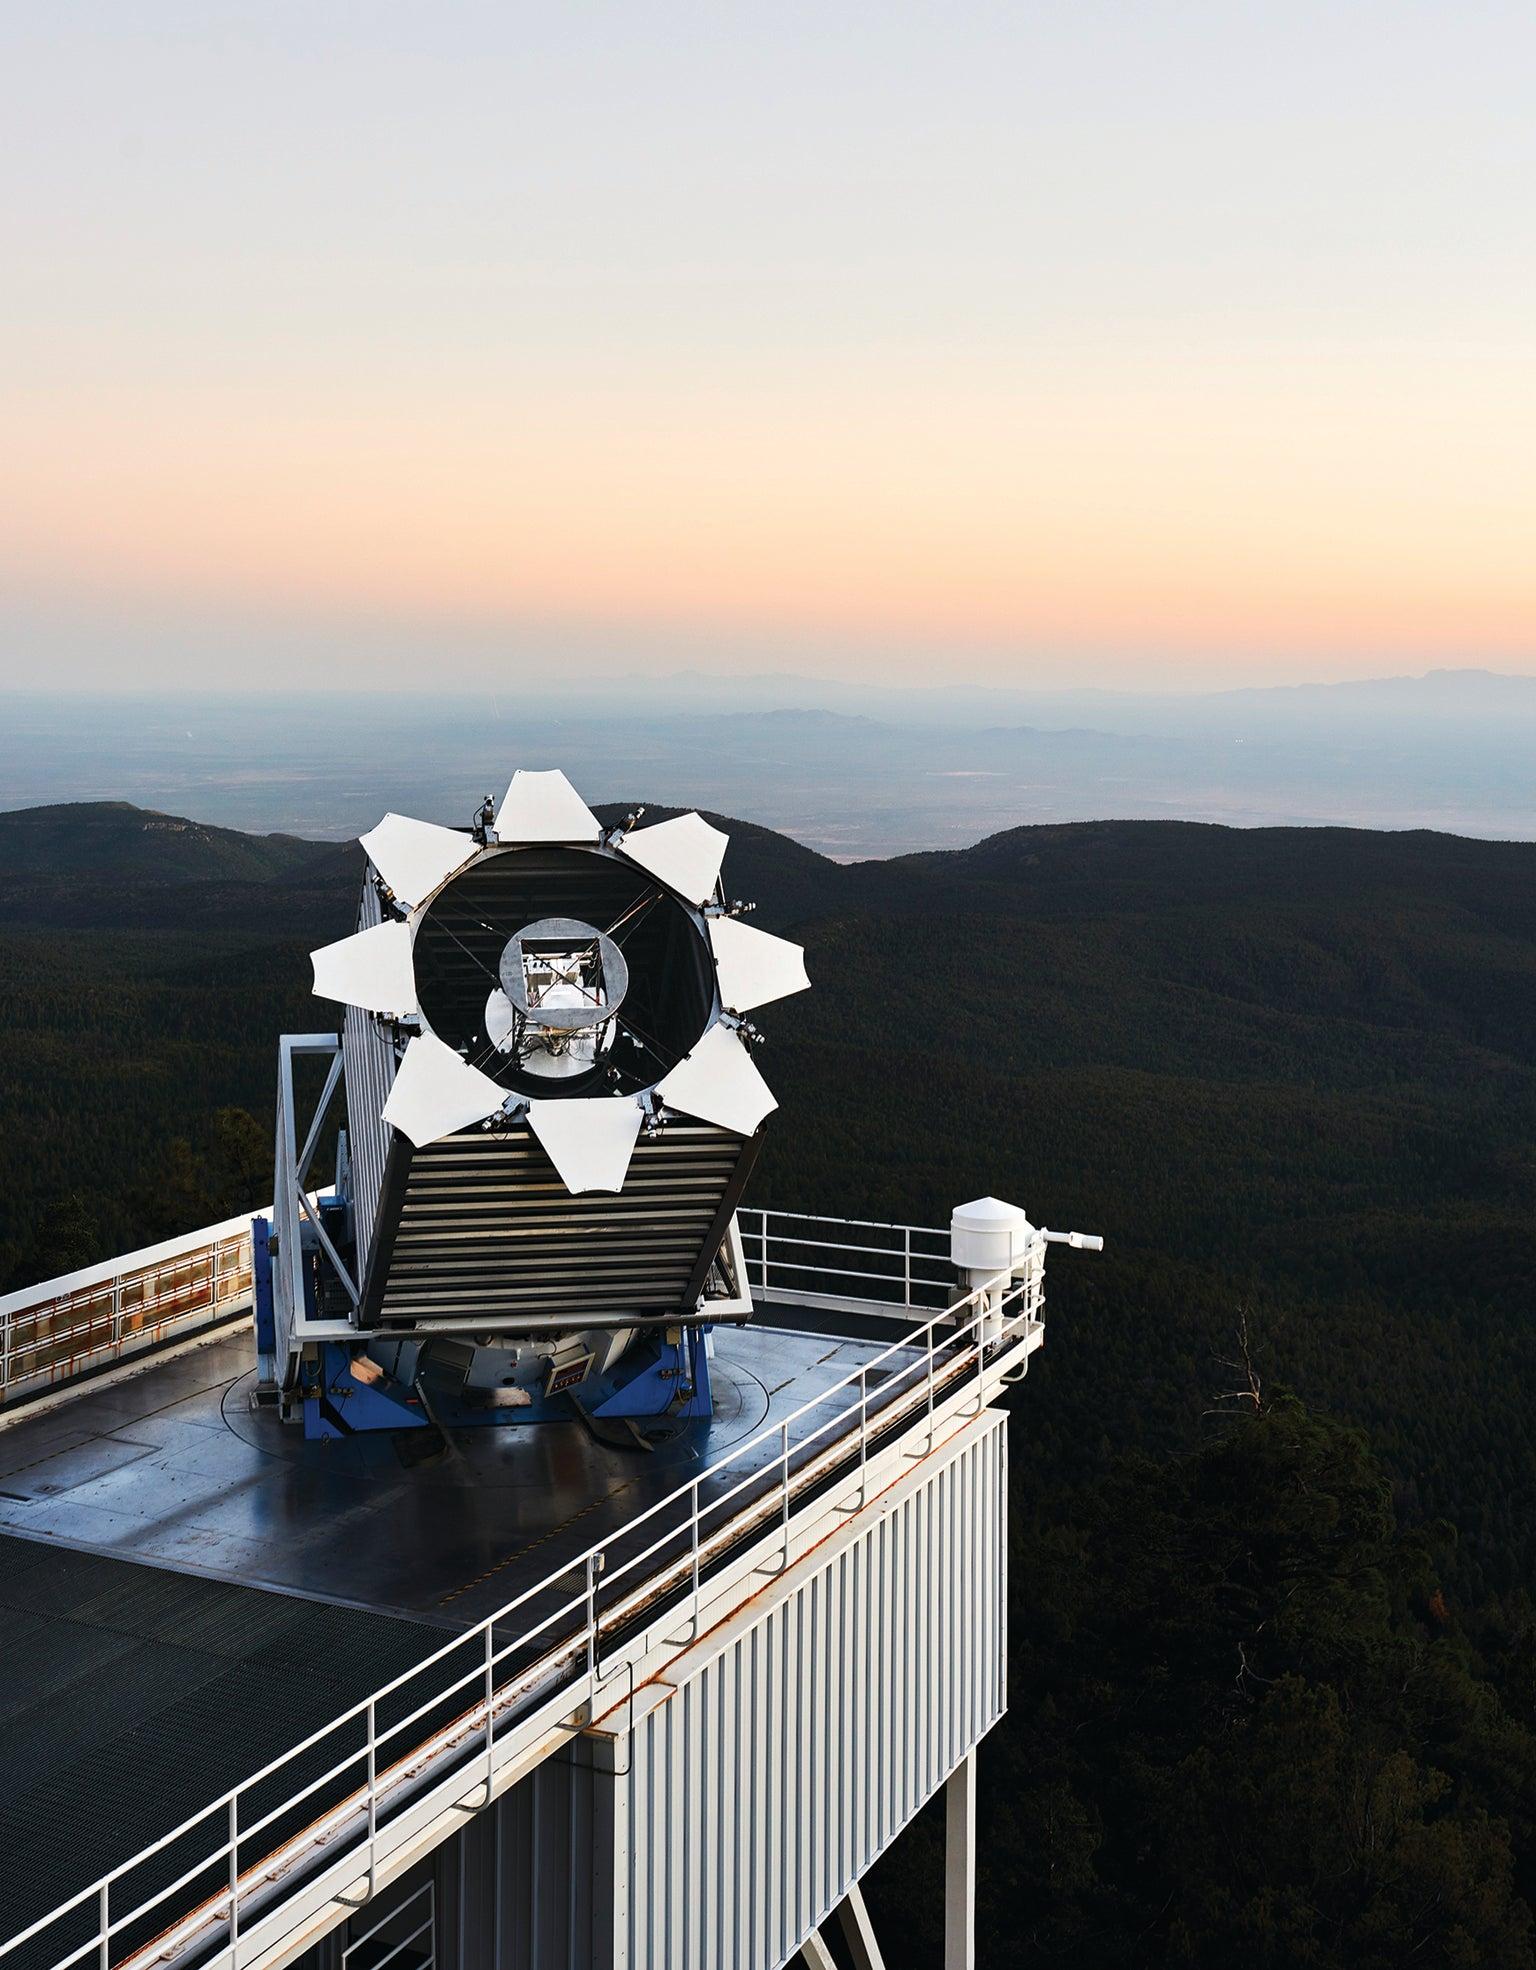 Sloan Foundation 2.5-meter Telescope.